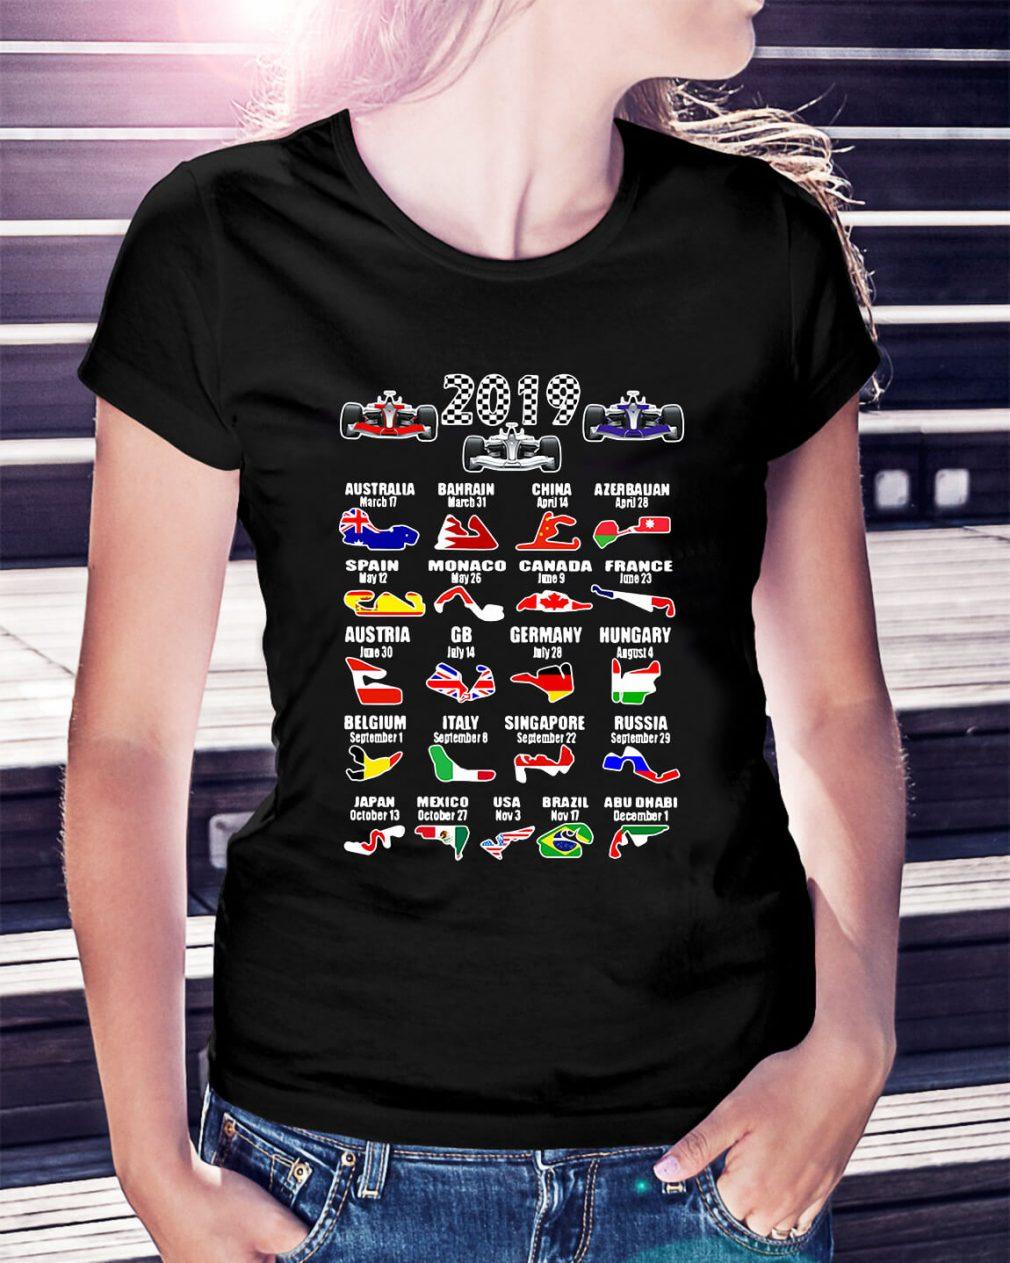 2019 racing calendar Australia Bahrain China Ladies Tee